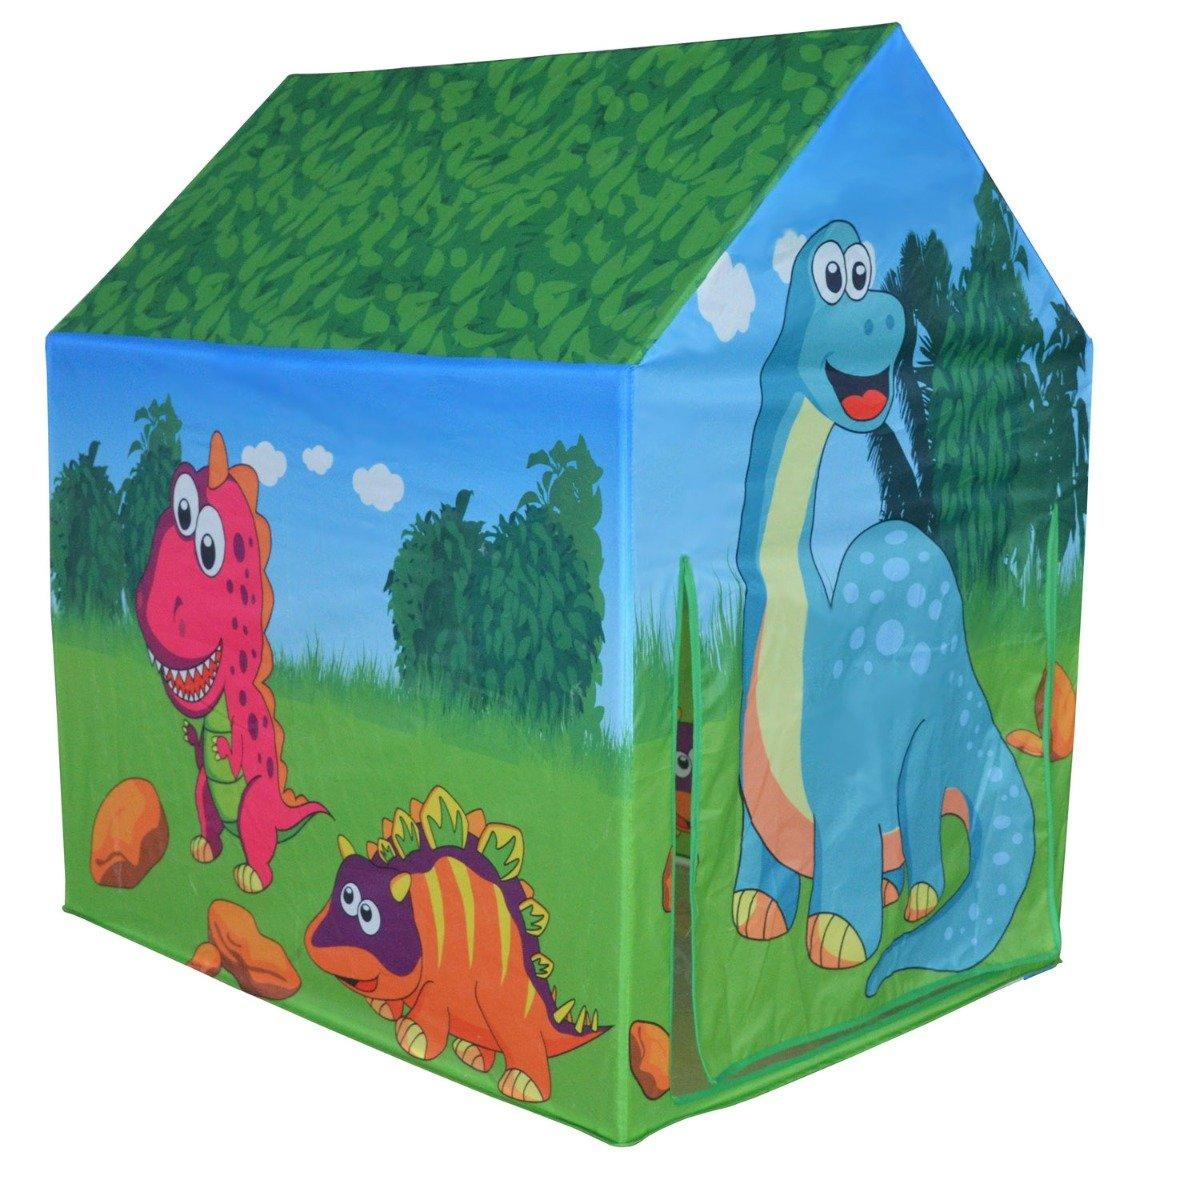 Cort pentru copii Iplay-Toys Dinosaur Tent